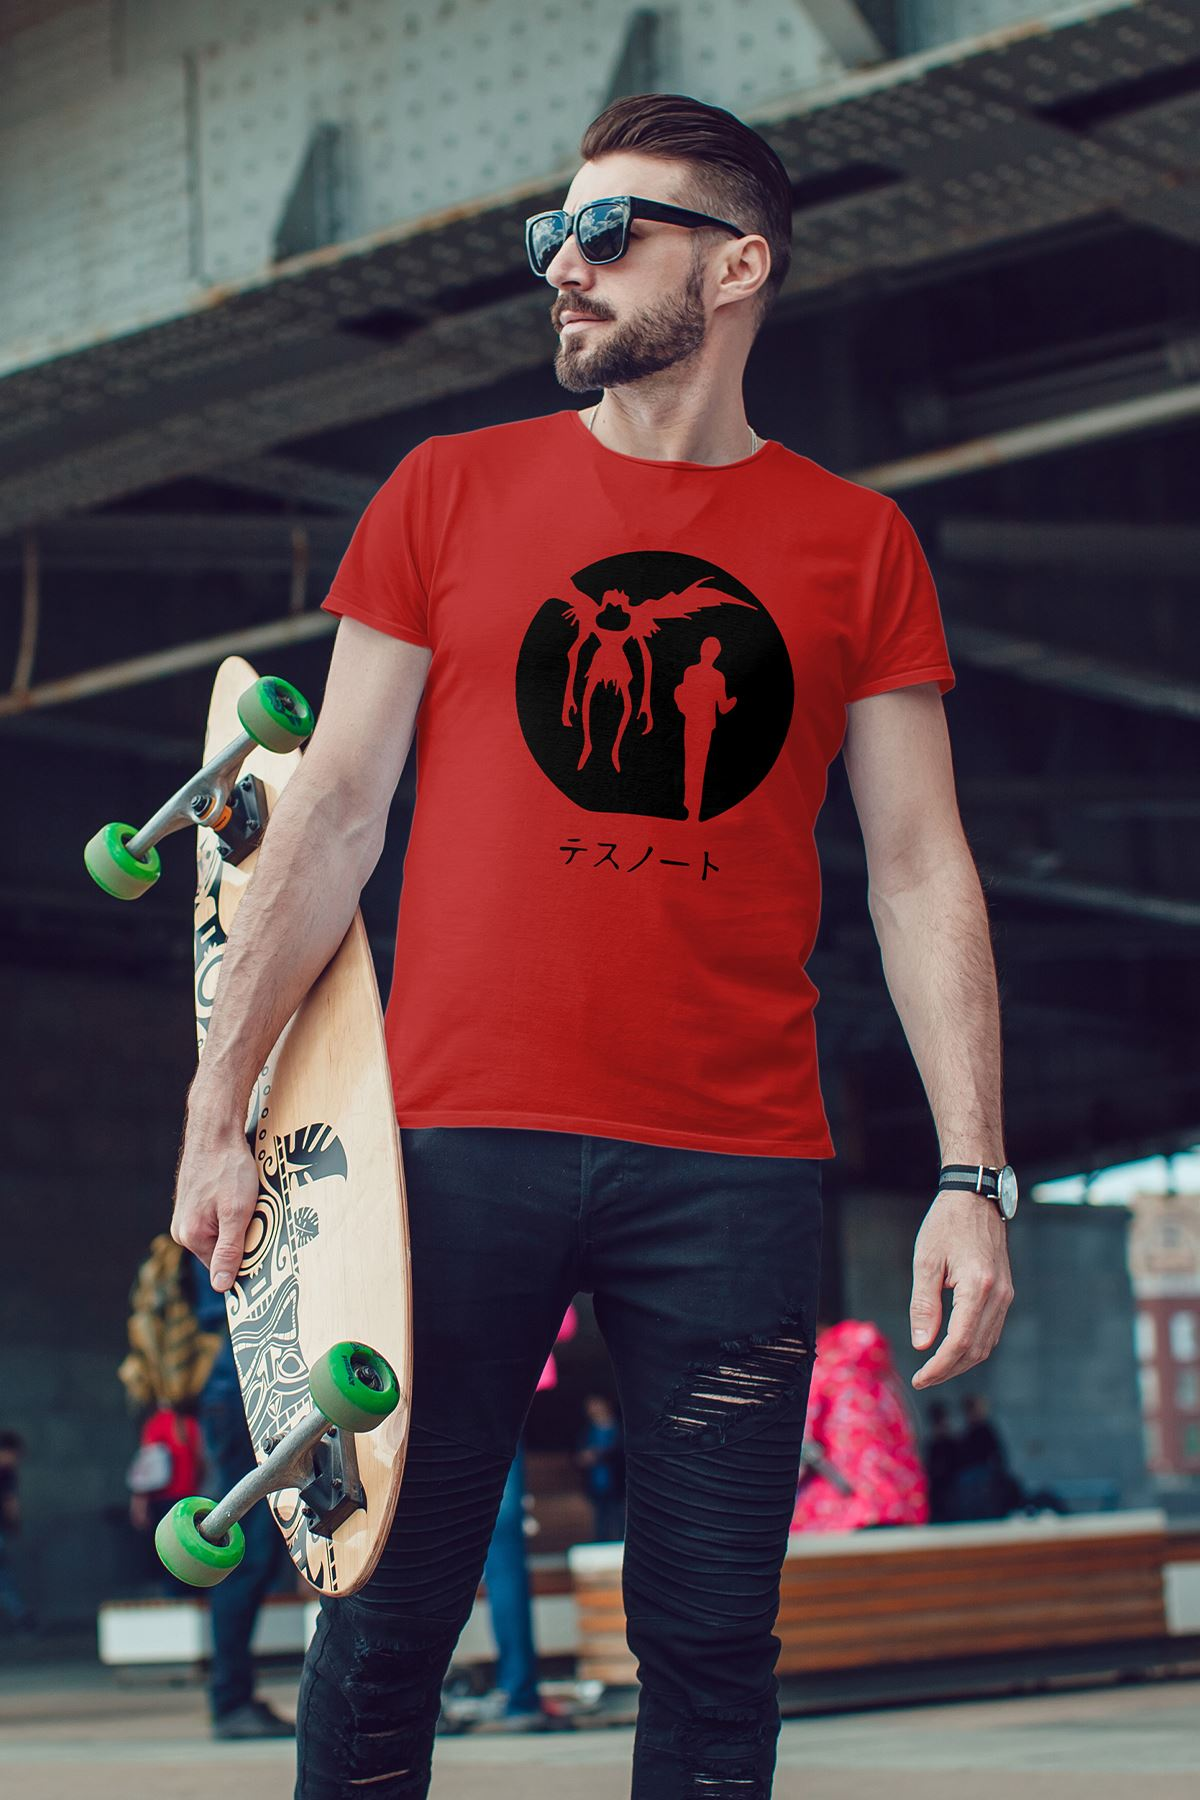 Anime Death Note 12 Kırmızı Erkek Tshirt - Tişört